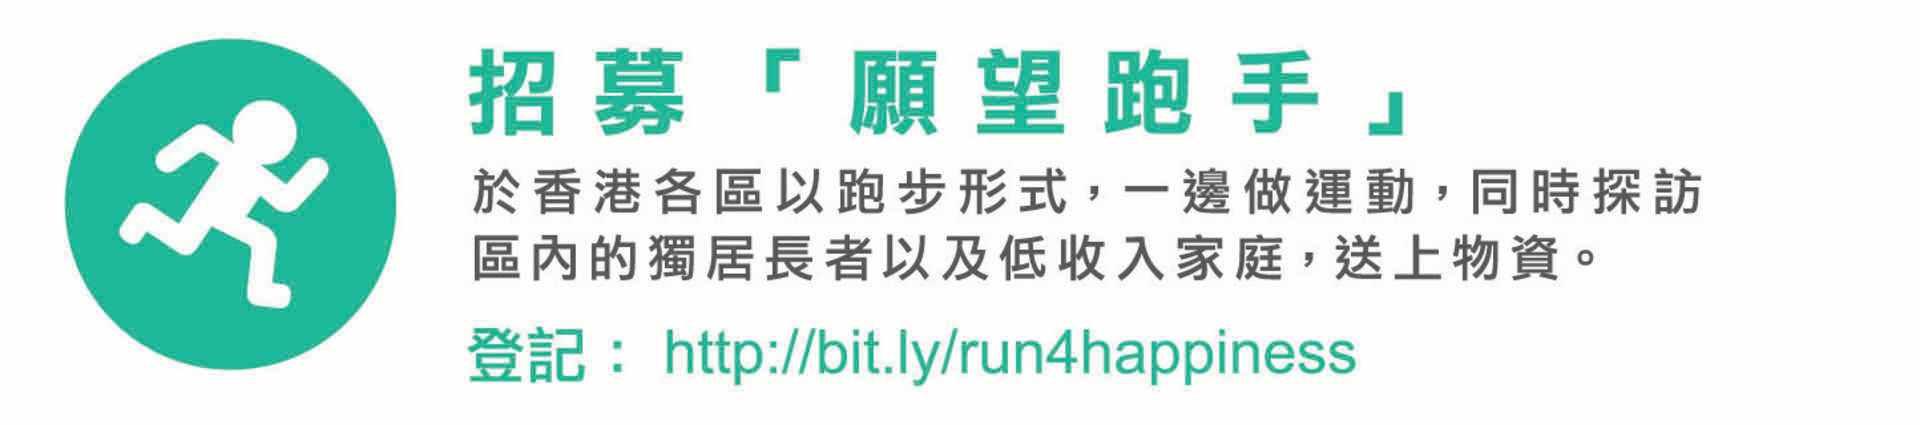 runforhappiness-07